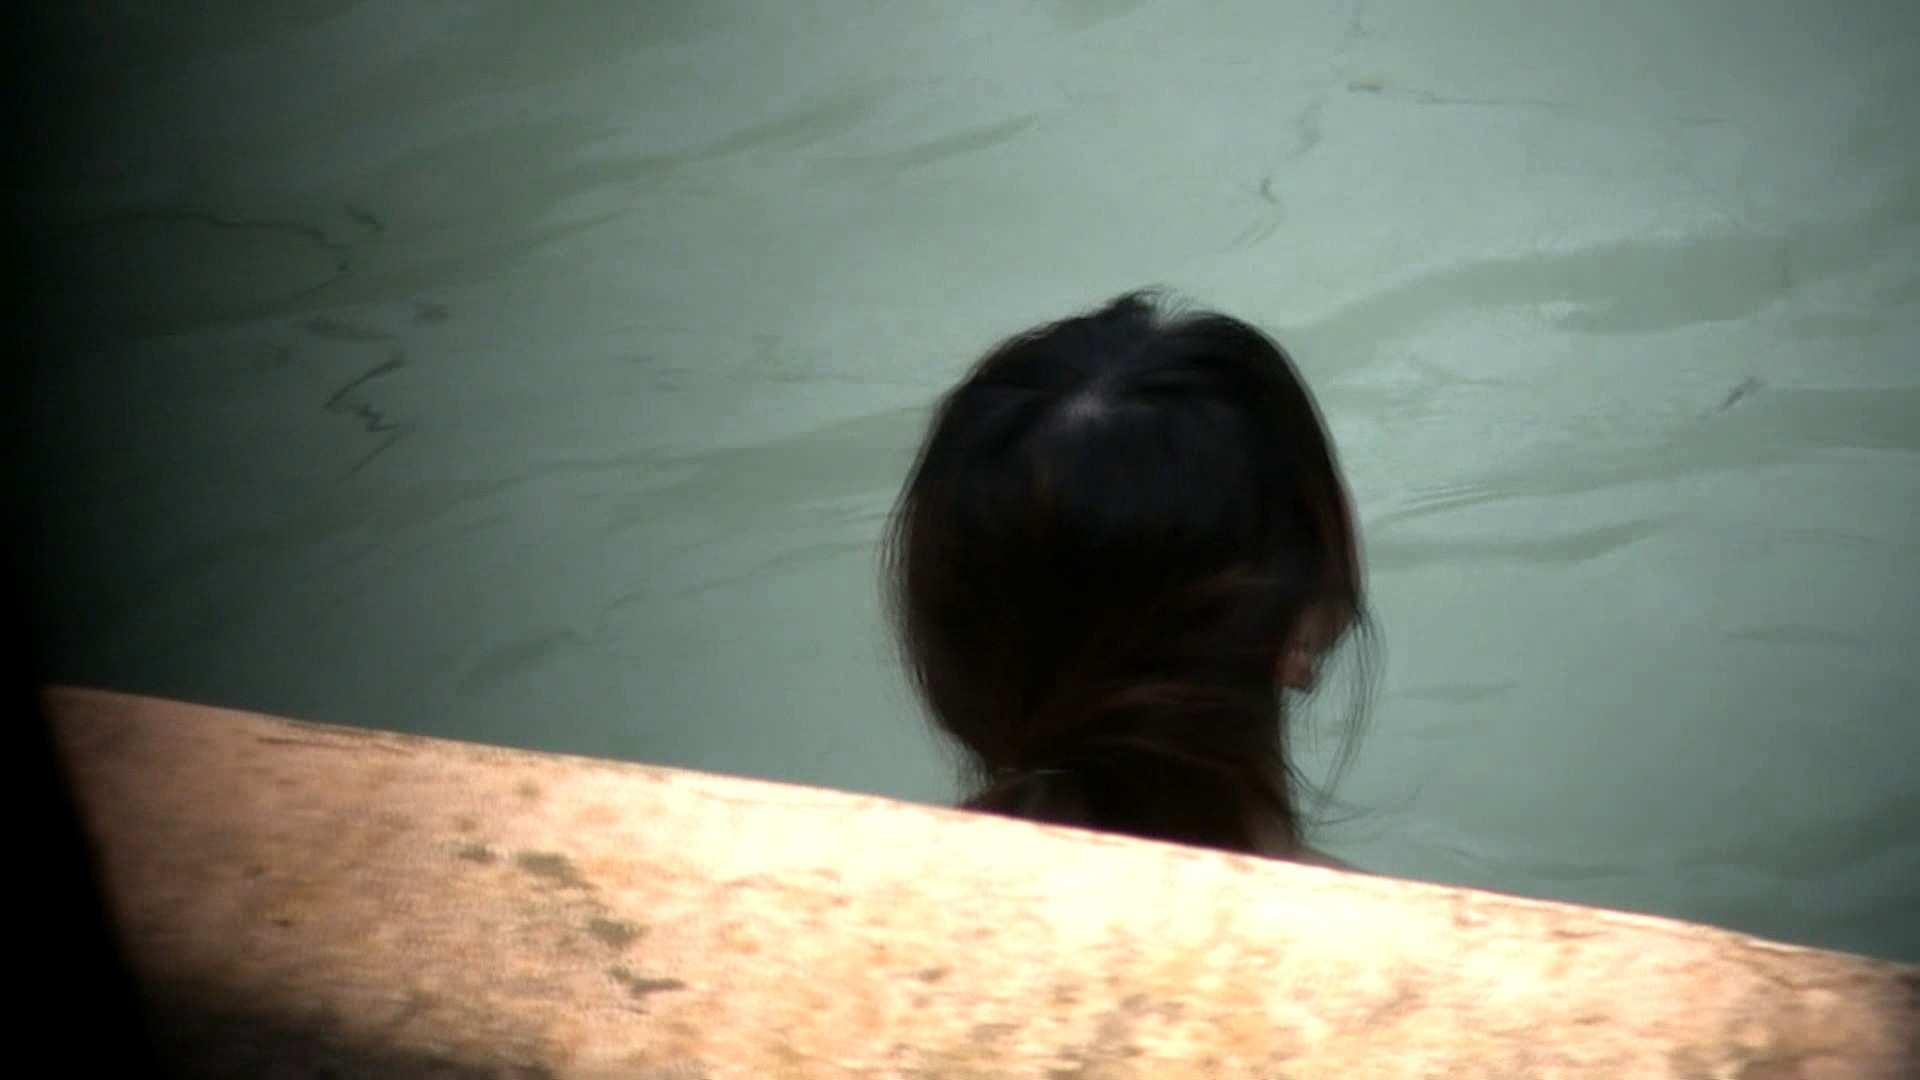 Aquaな露天風呂Vol.652 盗撮 | HなOL  105pic 105